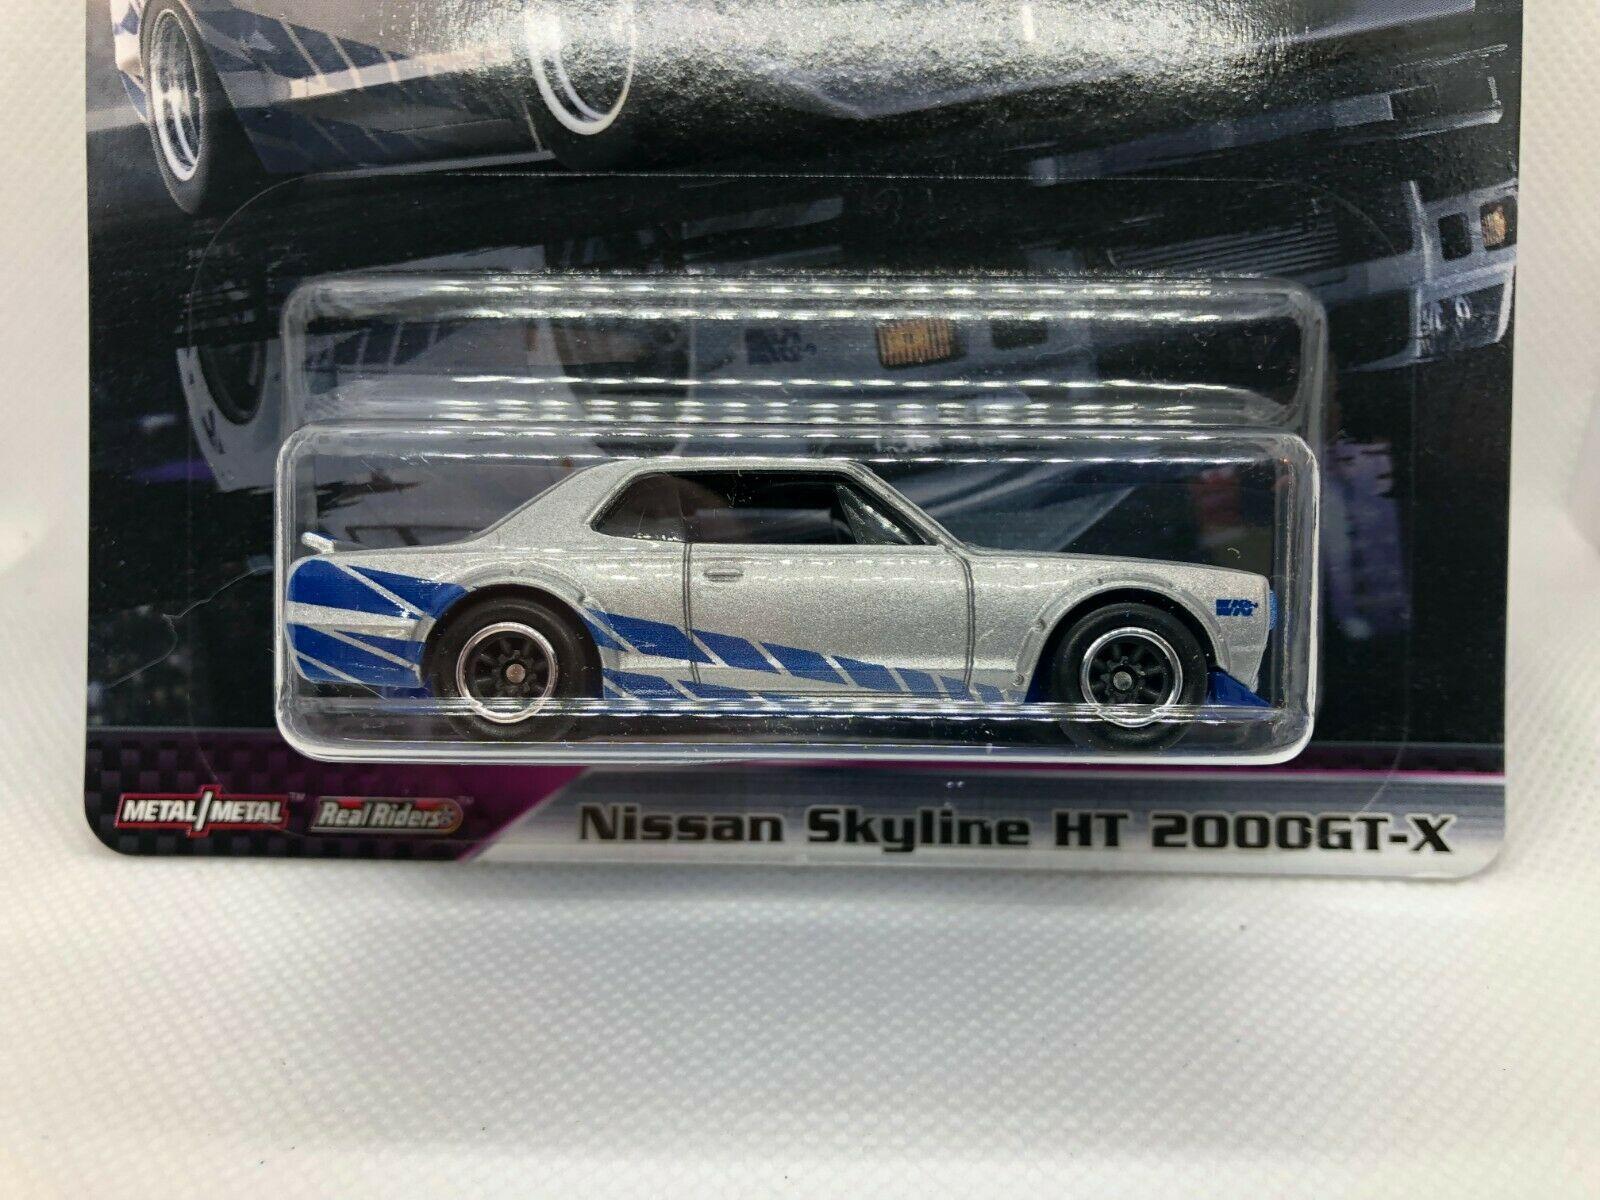 Nissan Skyline HT 2000GT